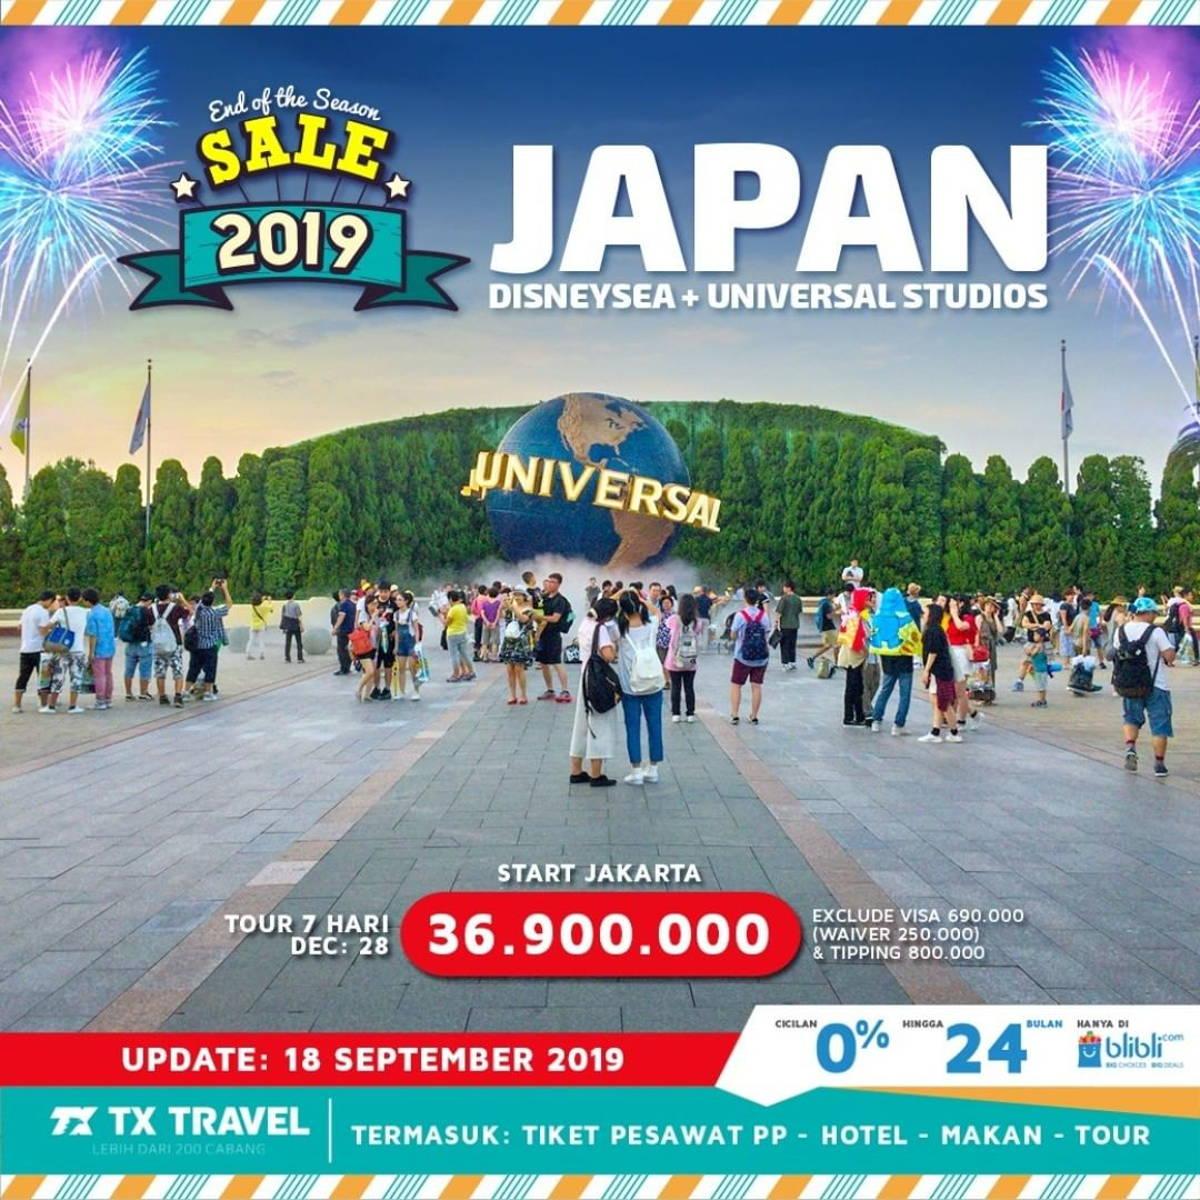 Katalog Promo: TX TRAVEL: Promo Tour Jepang 2019 JAPAN Disneysea + Universal Studios Rp. 36.900.000 - 1